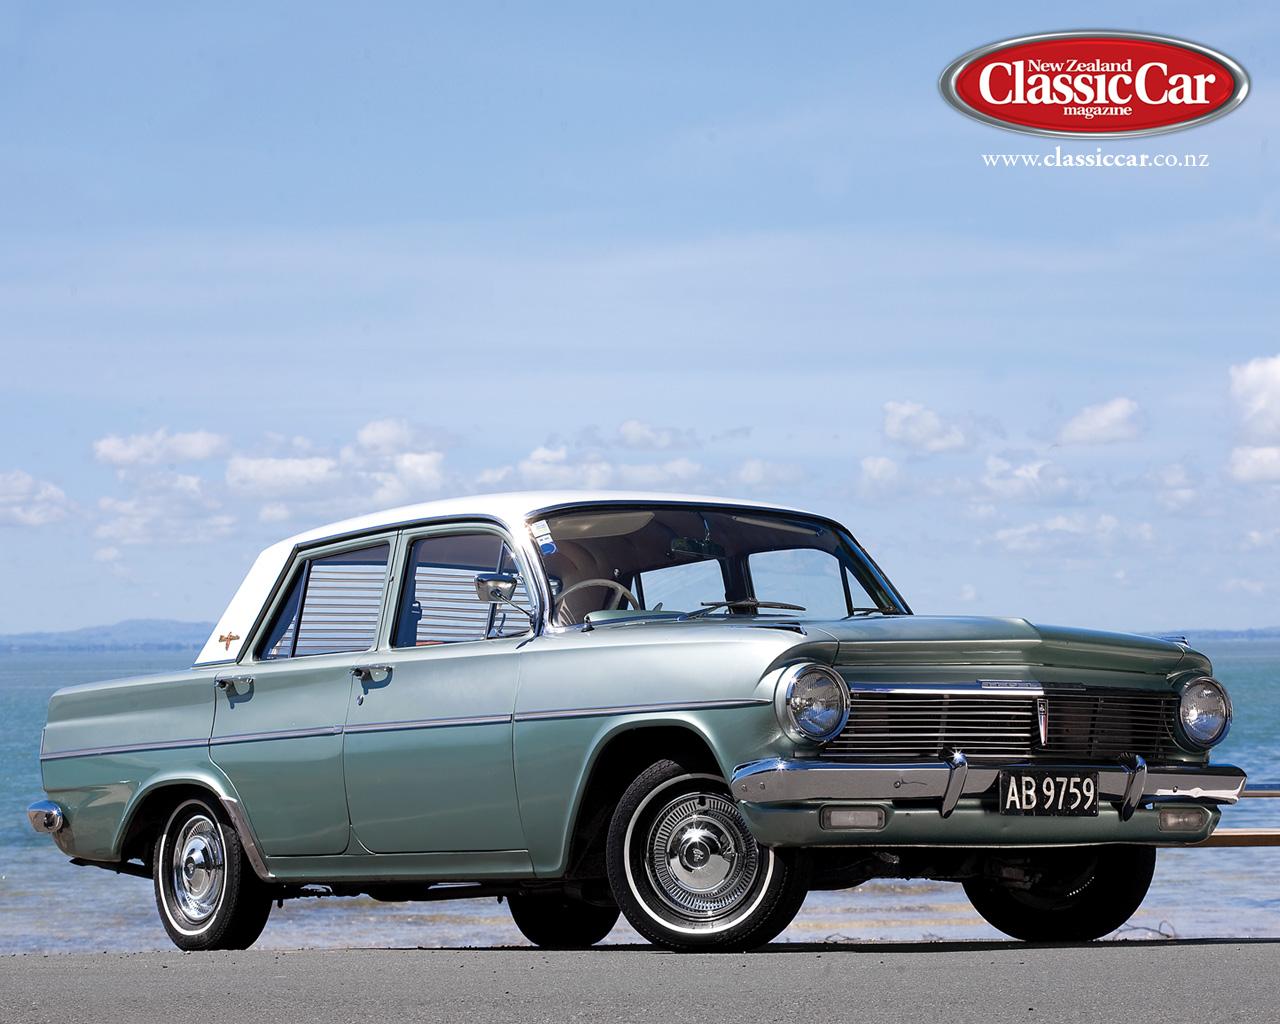 transpress nz  1964 Holden EH Premier